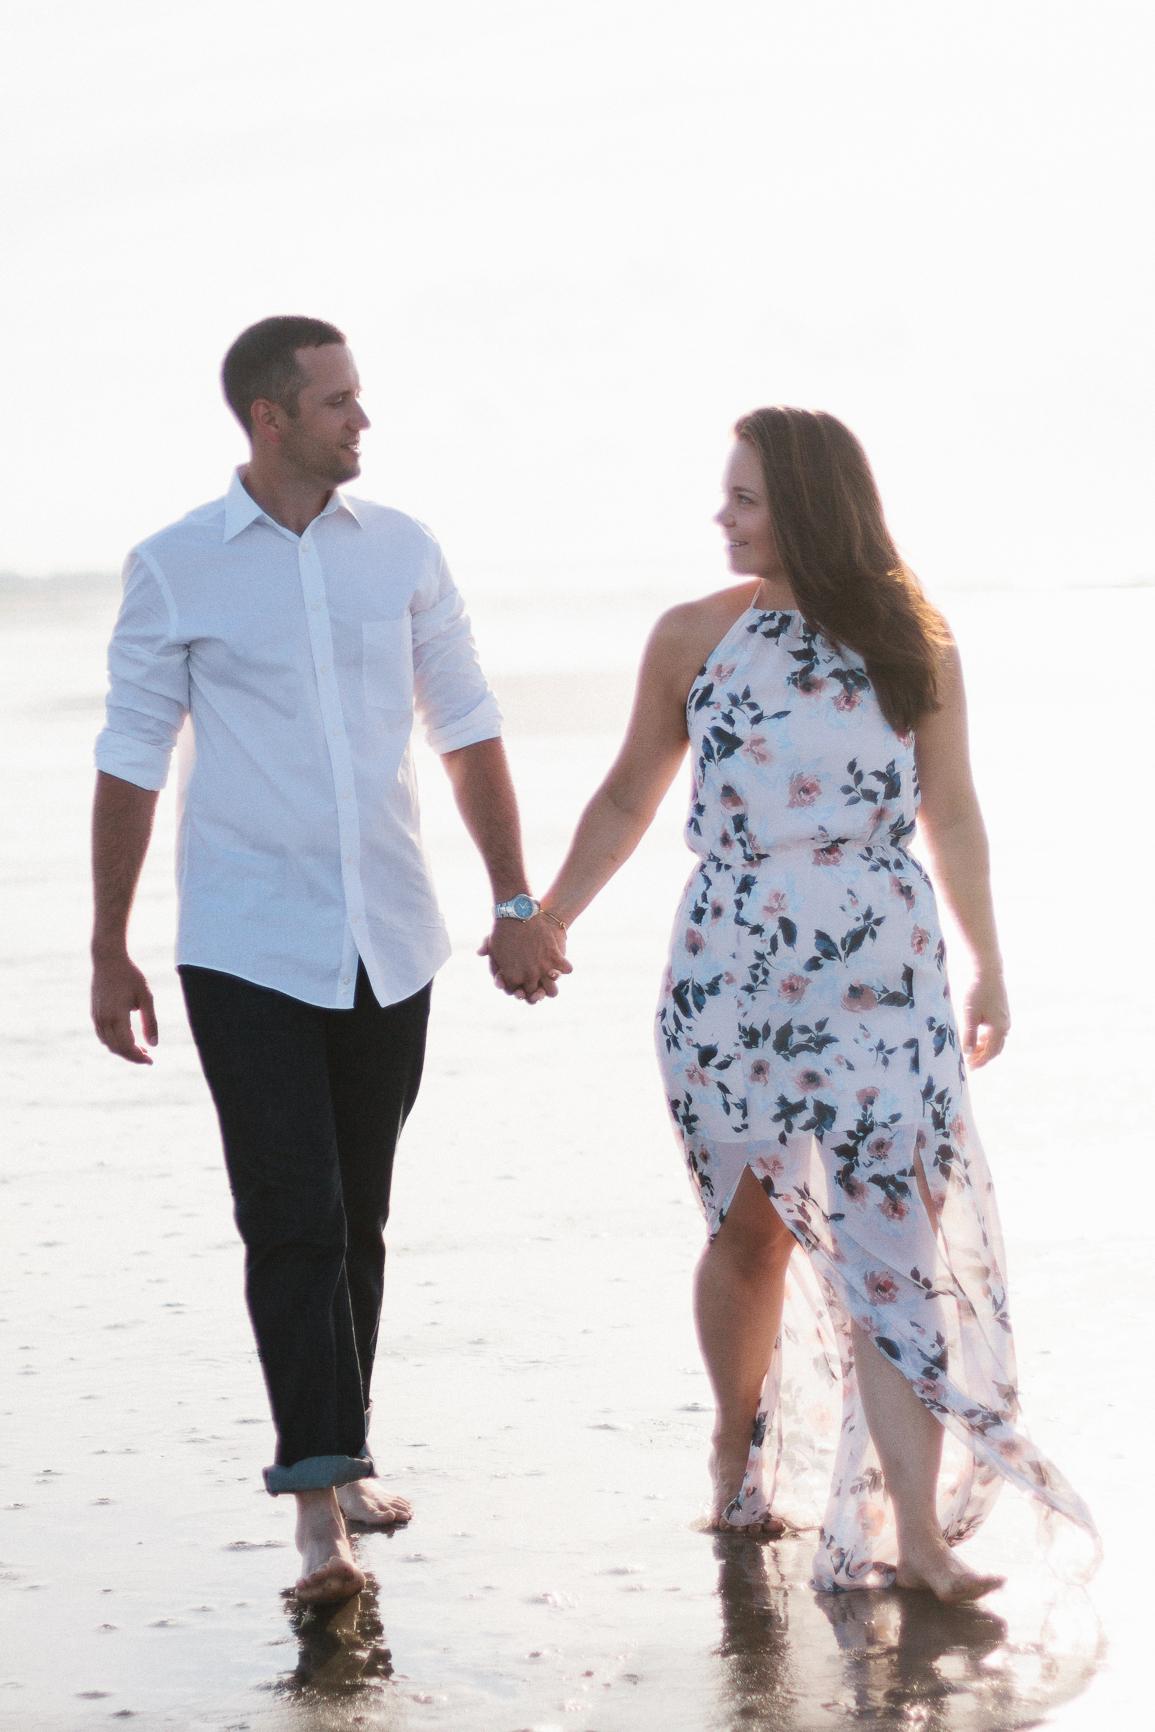 Engaged couple walking on the beach at Kiawah Island Beach Resort, Kiawah Island South Carolina by Danielle Gallo Photography